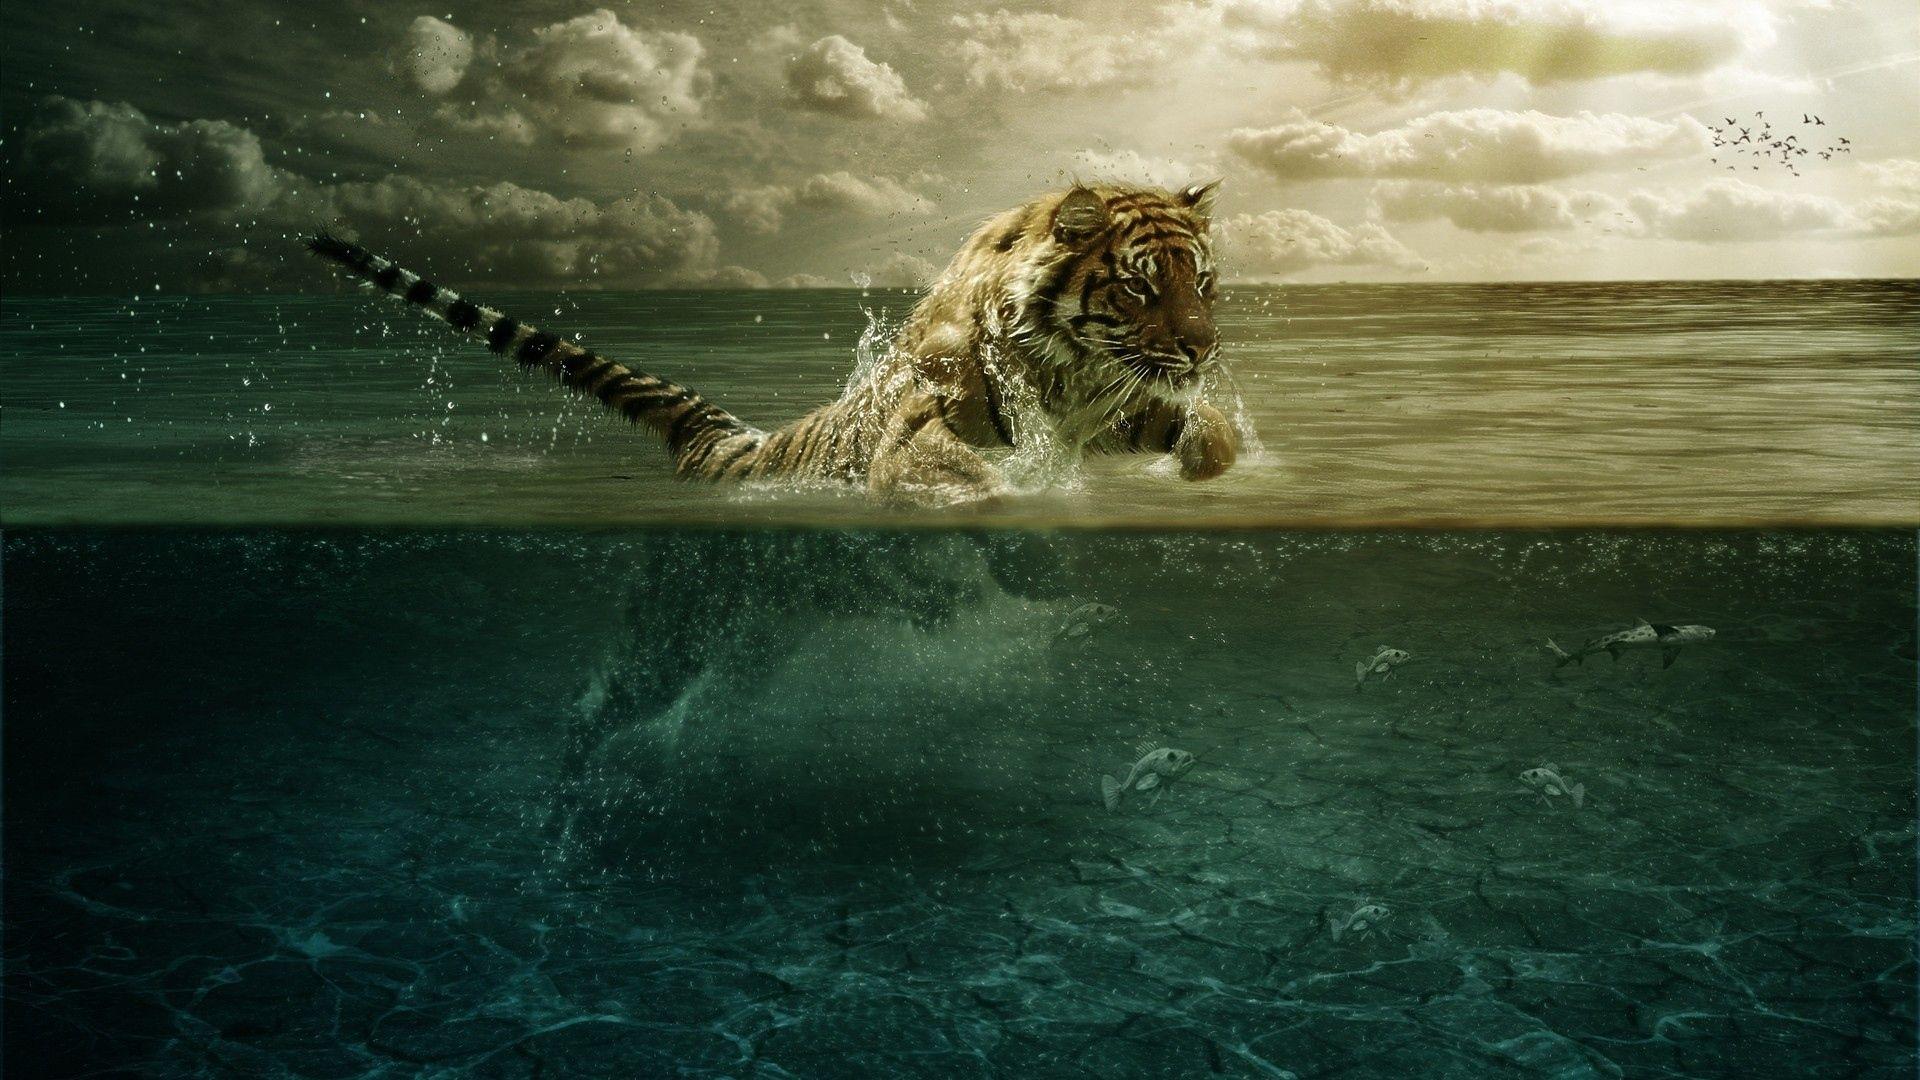 tiger wallpapers desktop background   animals wallpapers   pinterest